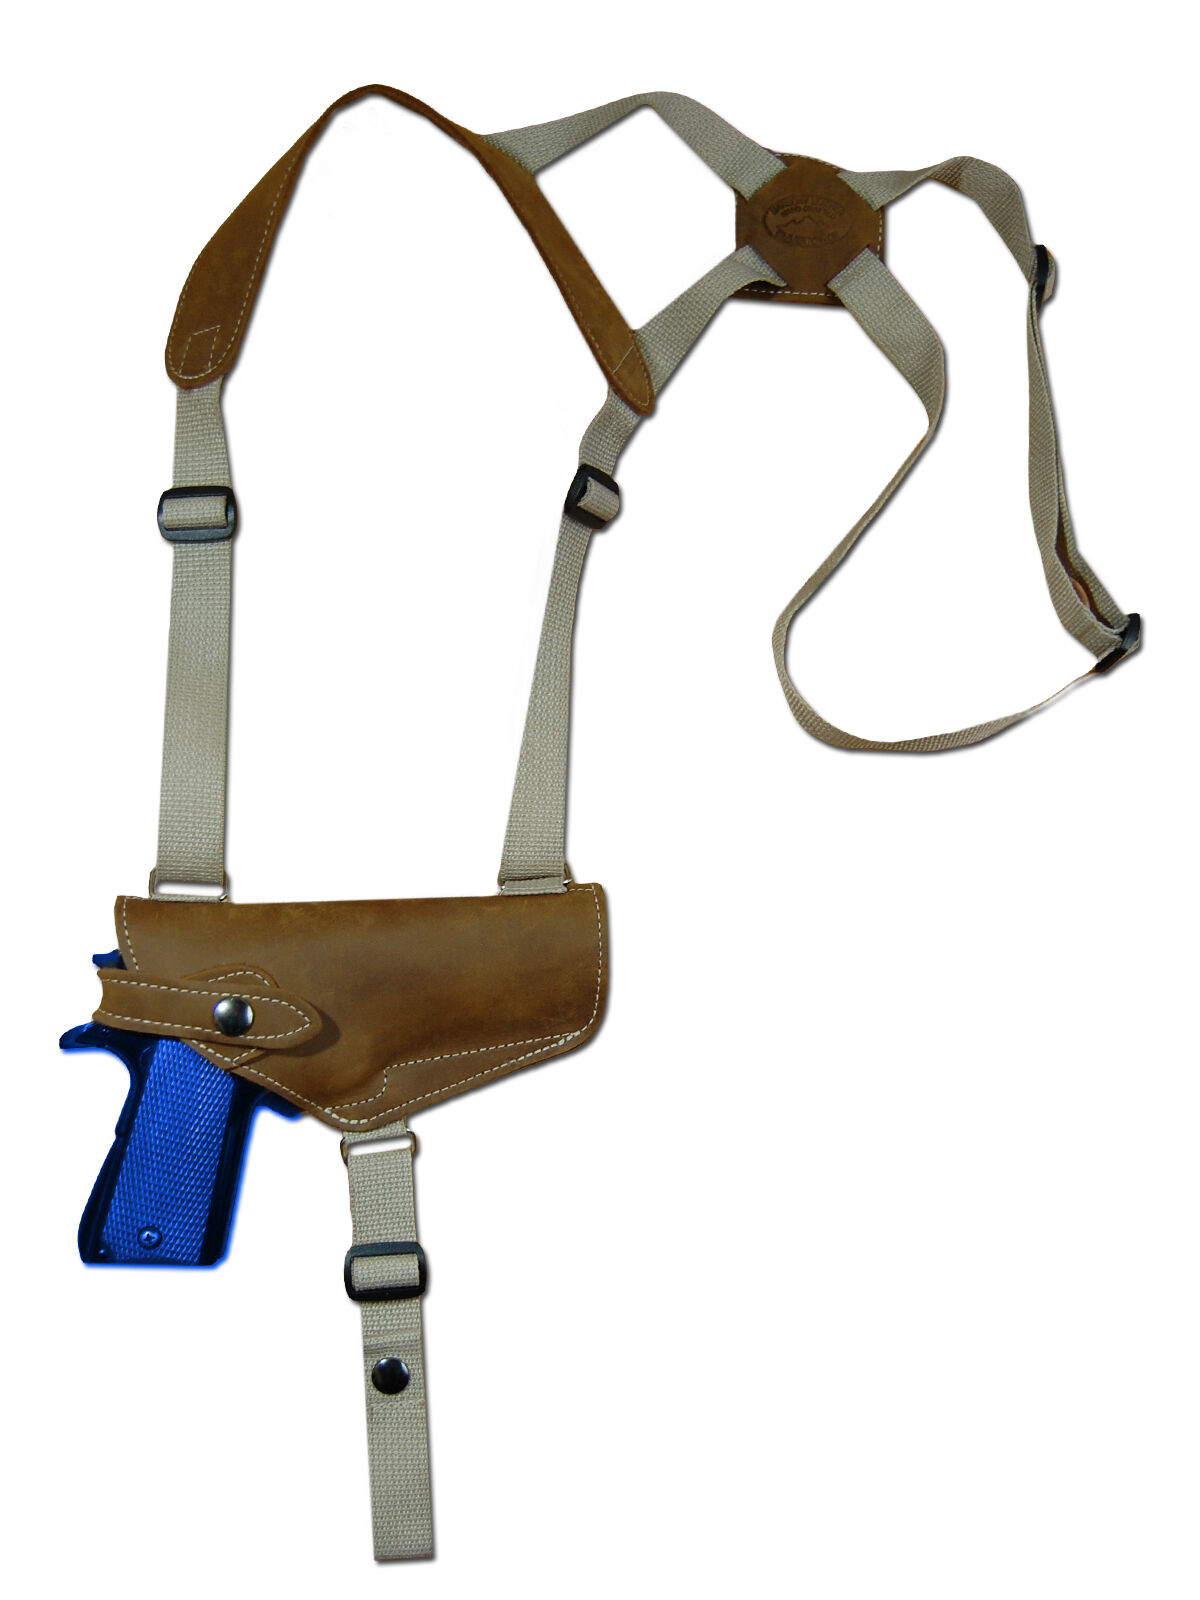 NEW Barsony Olive Drab Leder Shoulder Holster for Taurus Full Größe 9mm 40 HOR